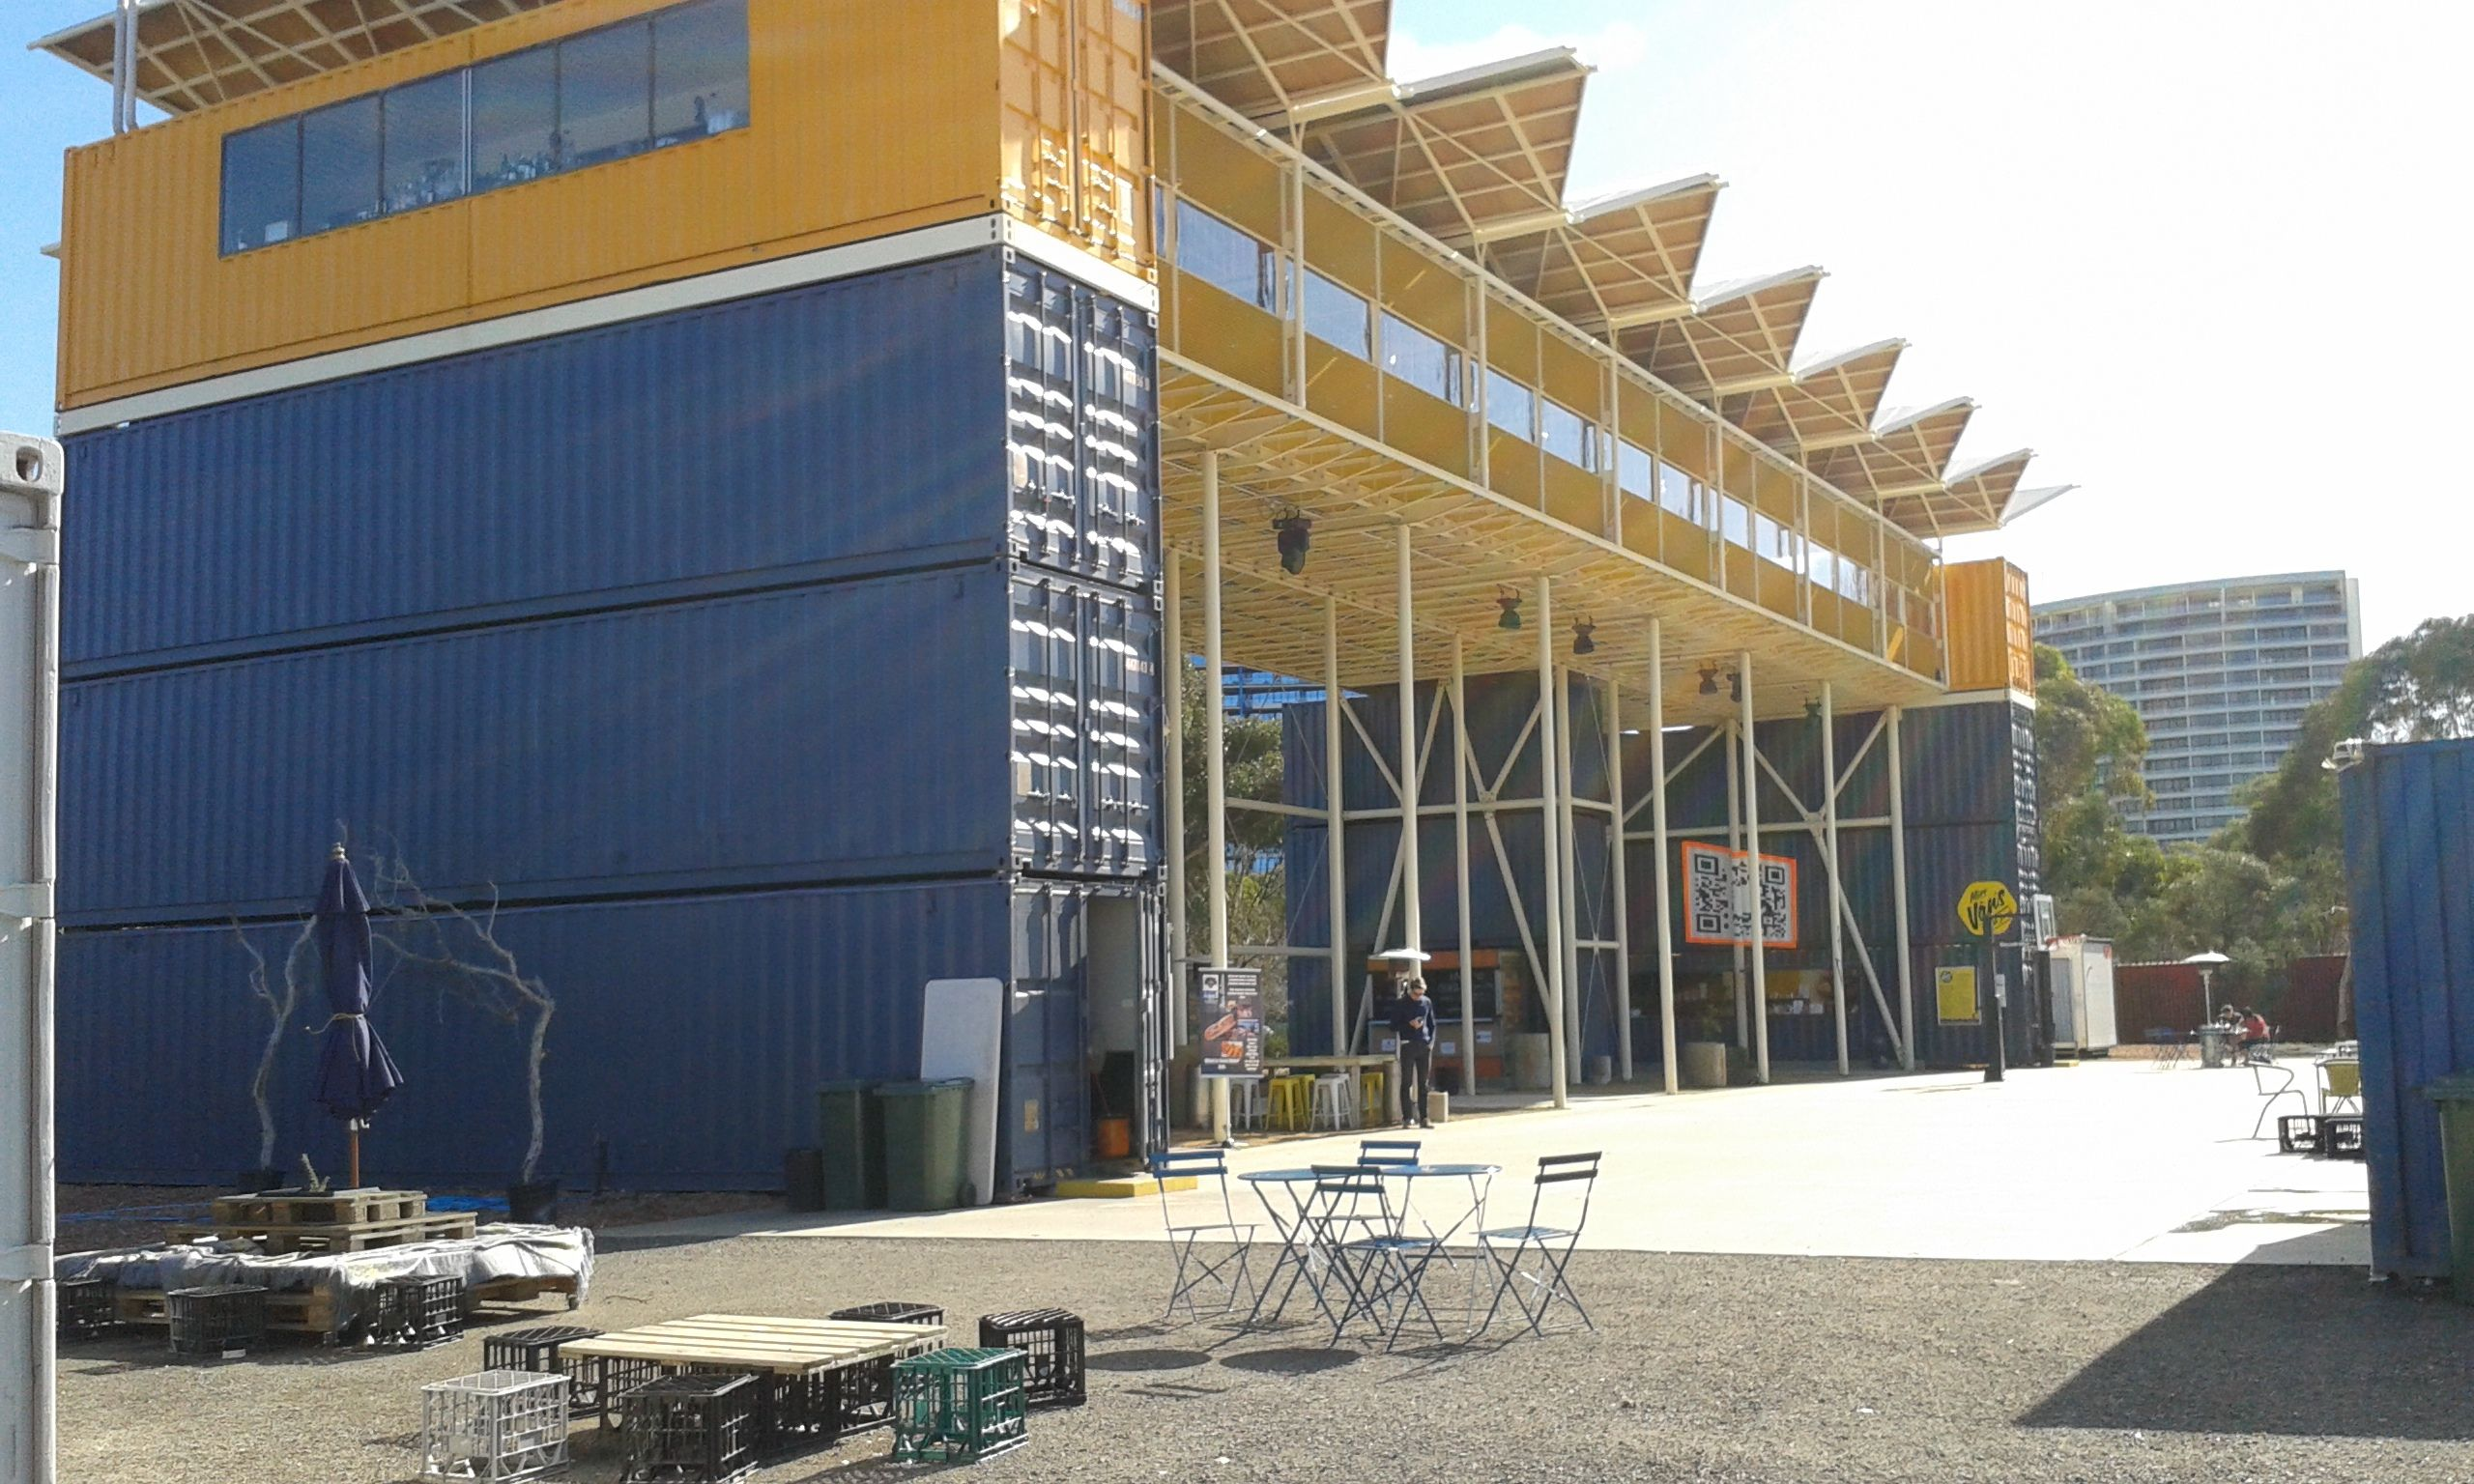 Westside Acton park stage 1 Canberra pop up village shipping